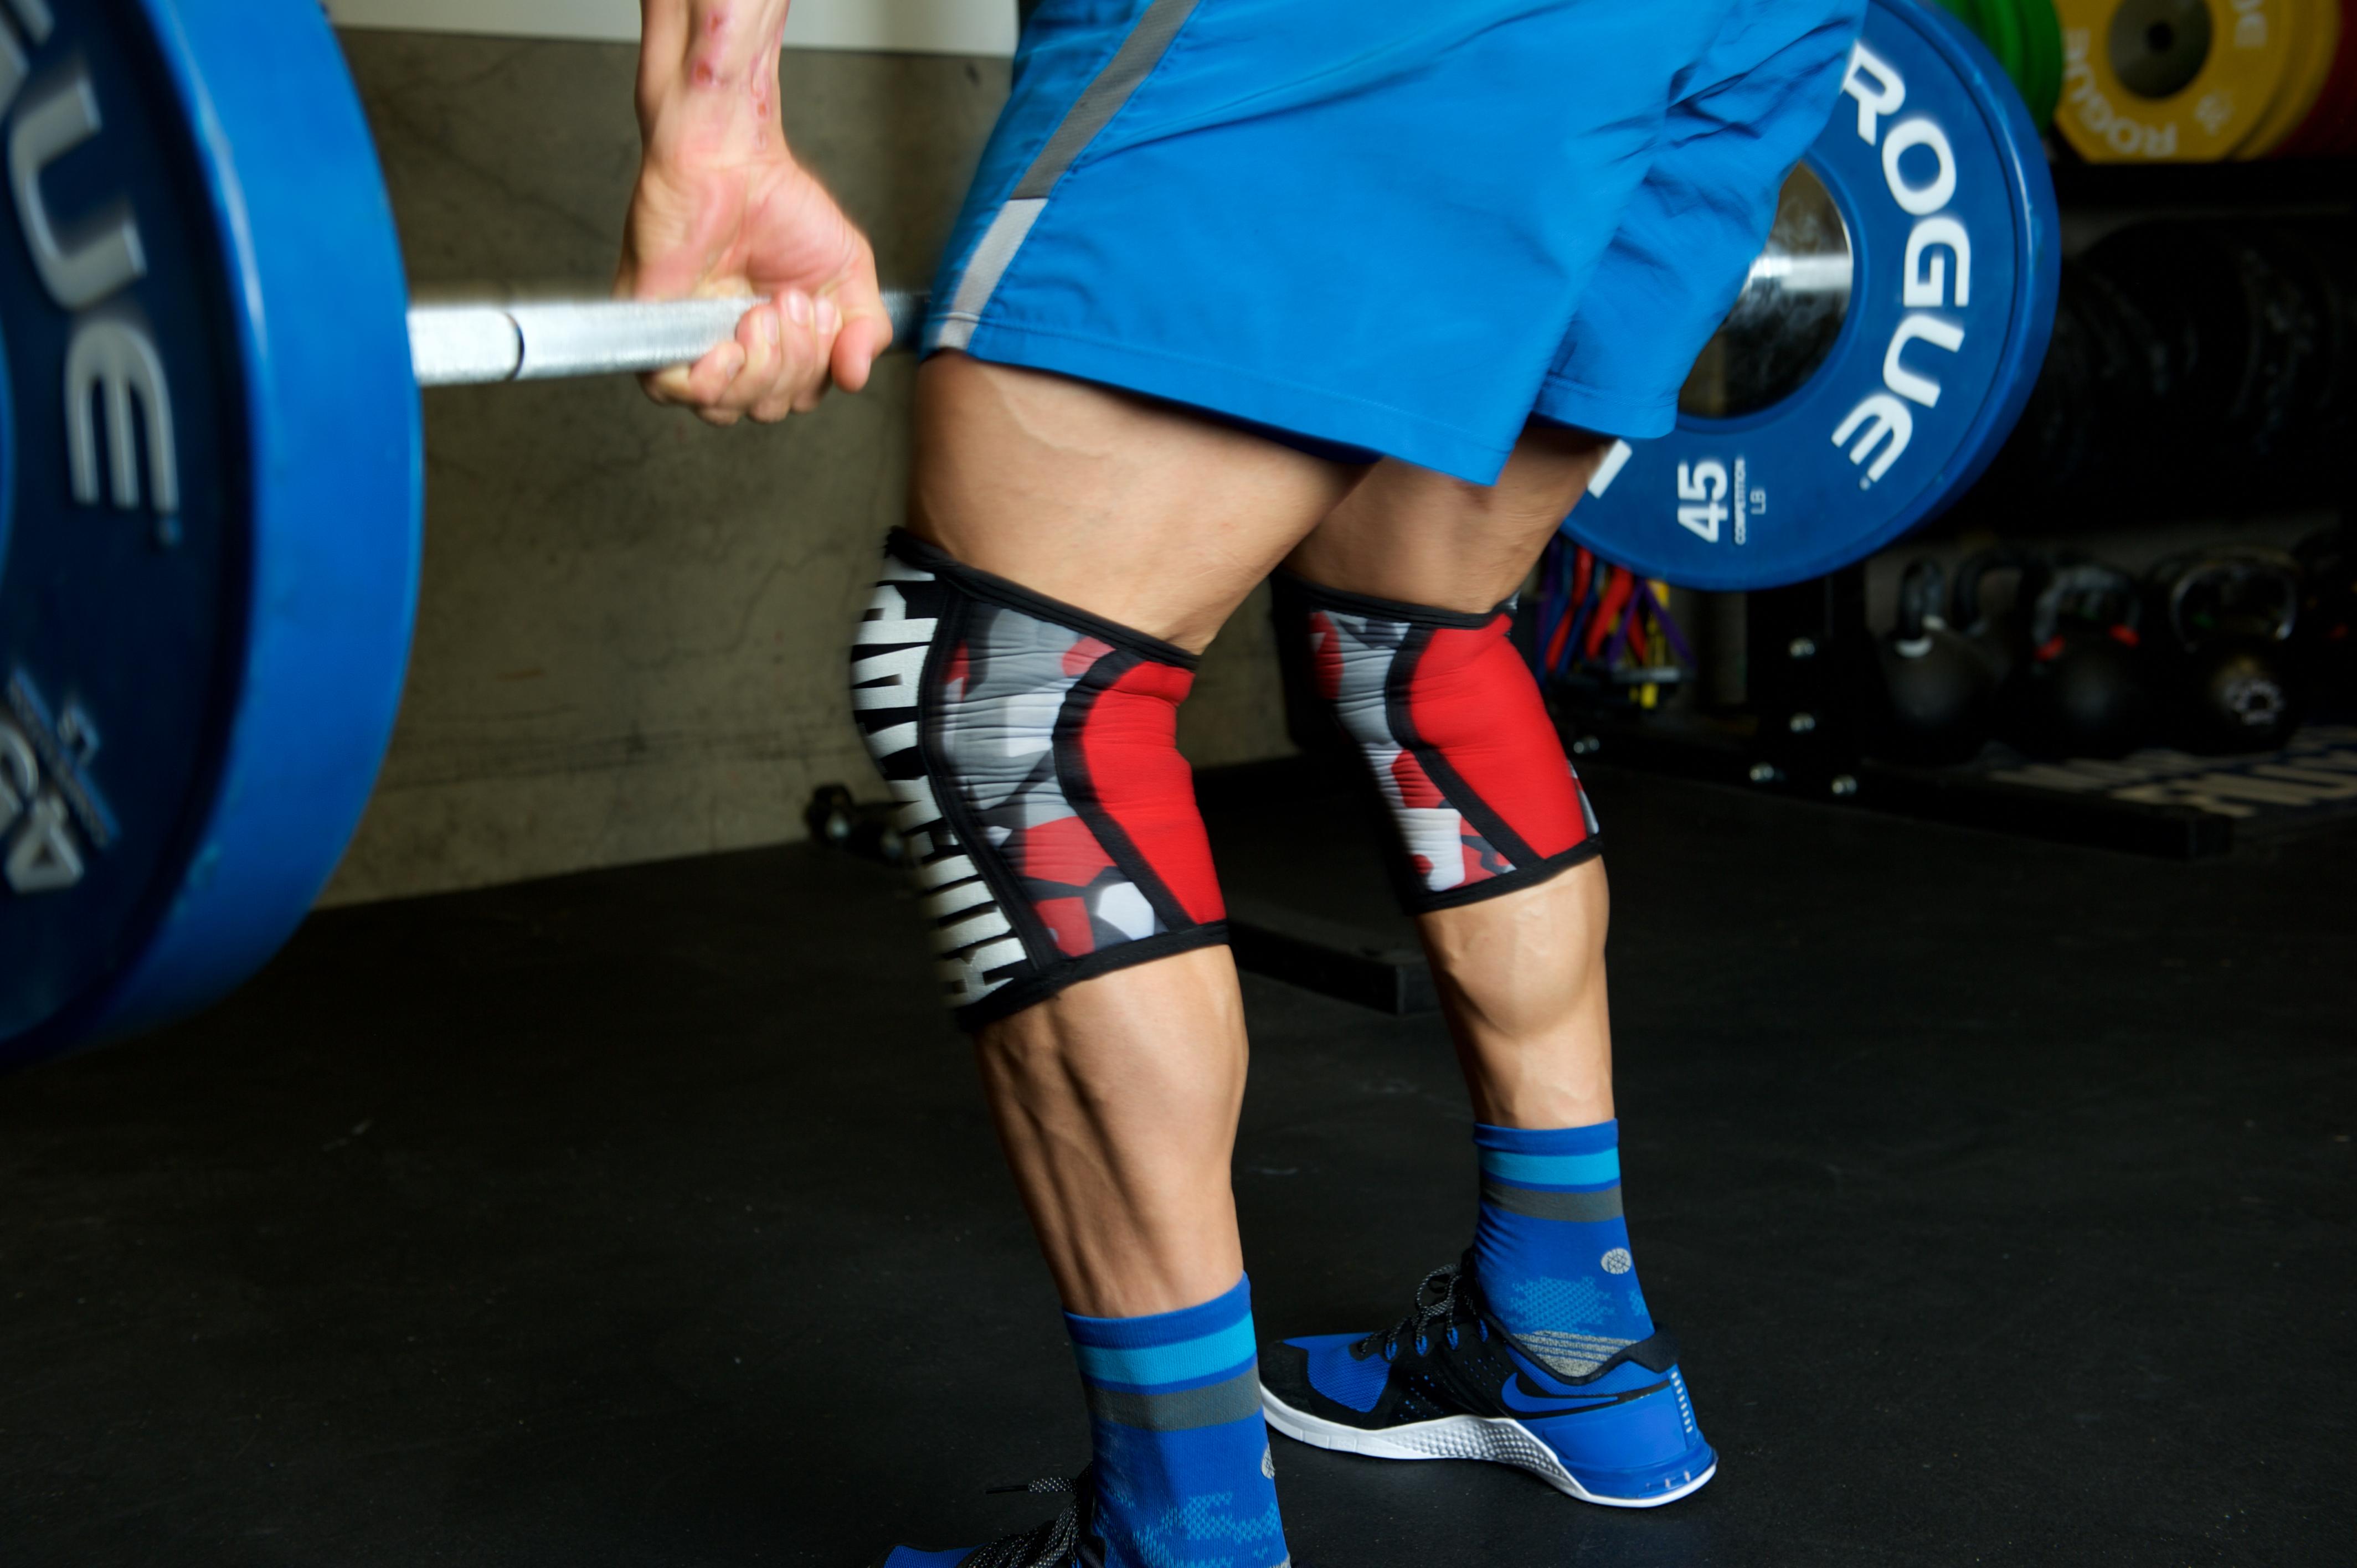 8161b7282d ... BAUERFEIND FITTERGEAR MCDAVID POWERDOT ROCKTAPE RUMBLE ROLLER SANCTBAND  SHOCK DOCTOR best knee brace for runner's knee ...